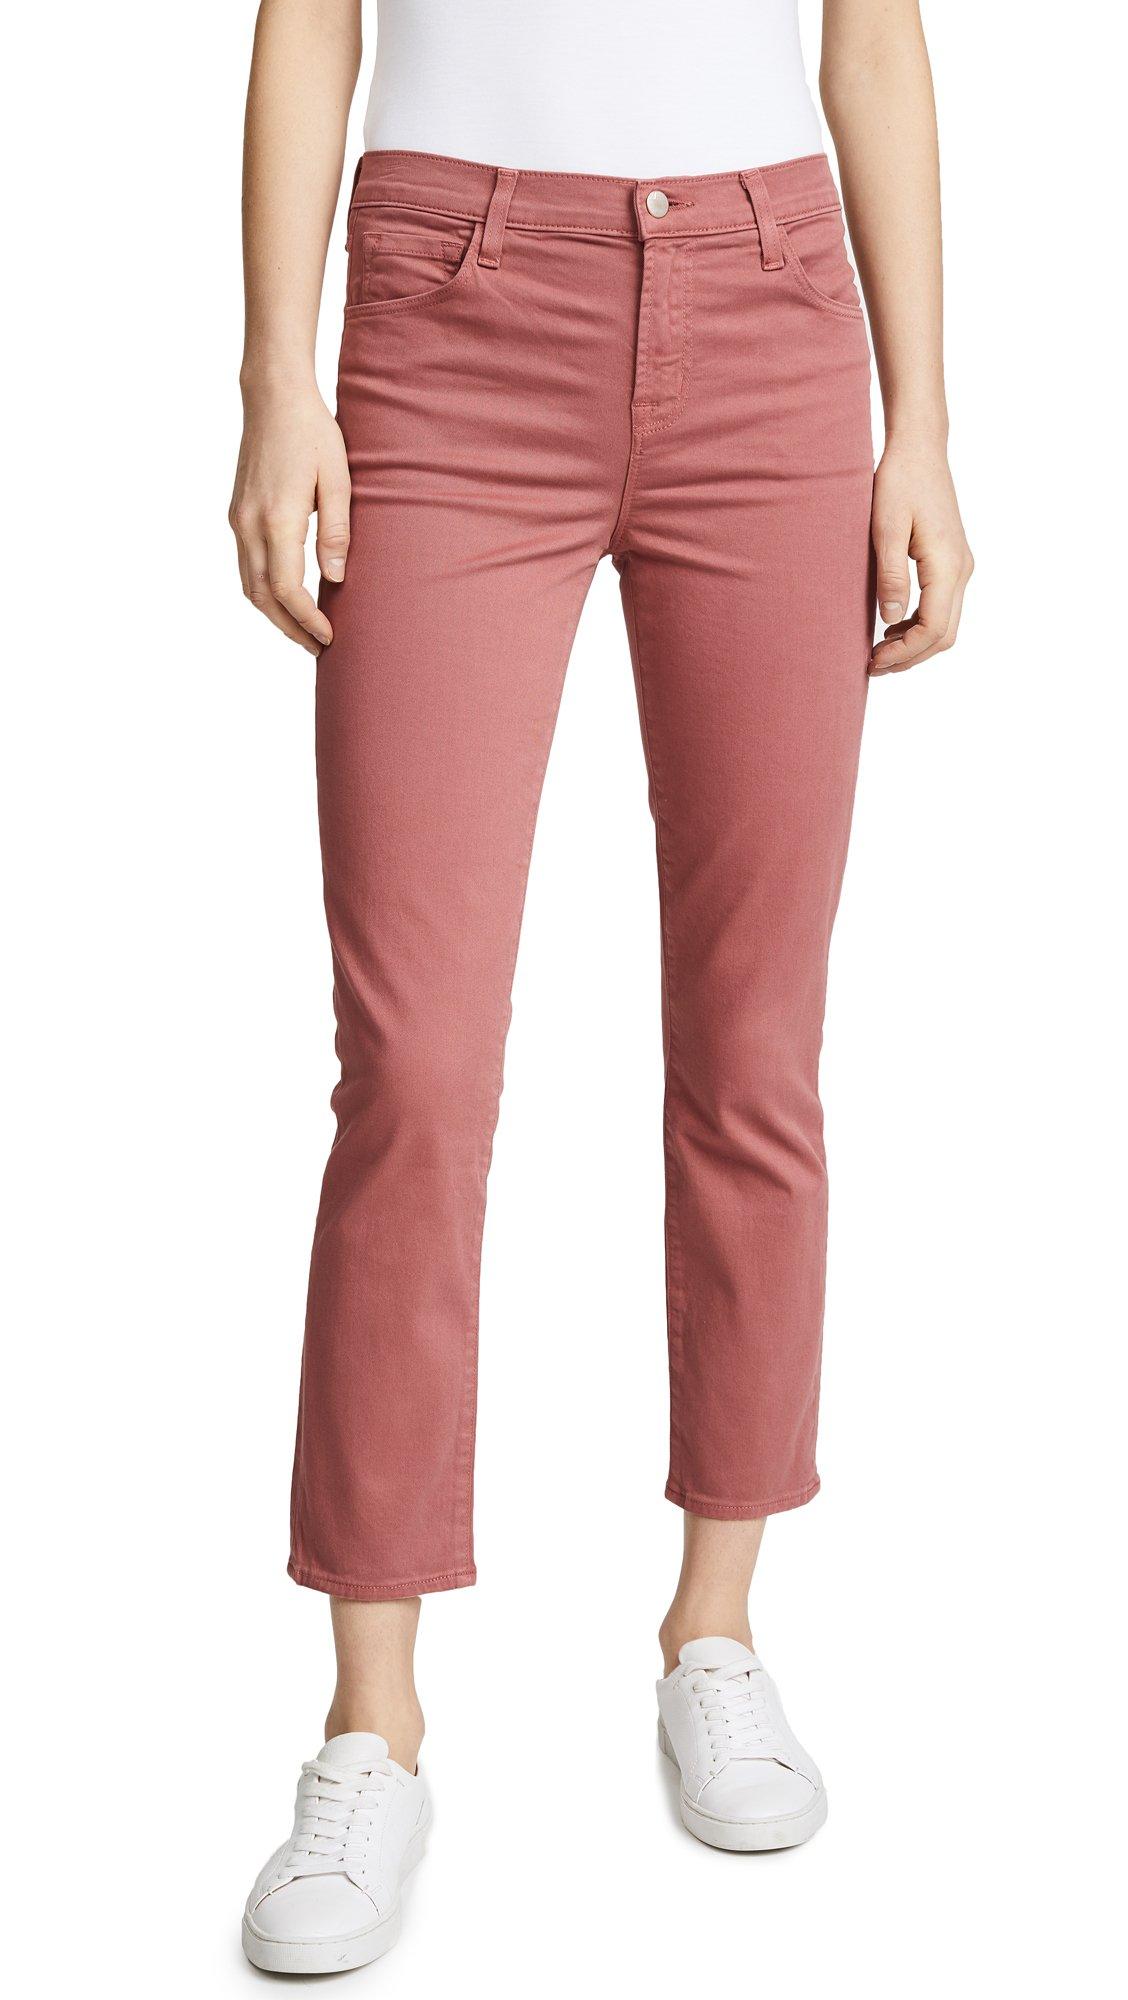 J Brand Women's Ruby High Rise Crop Jeans, Begonia, 26